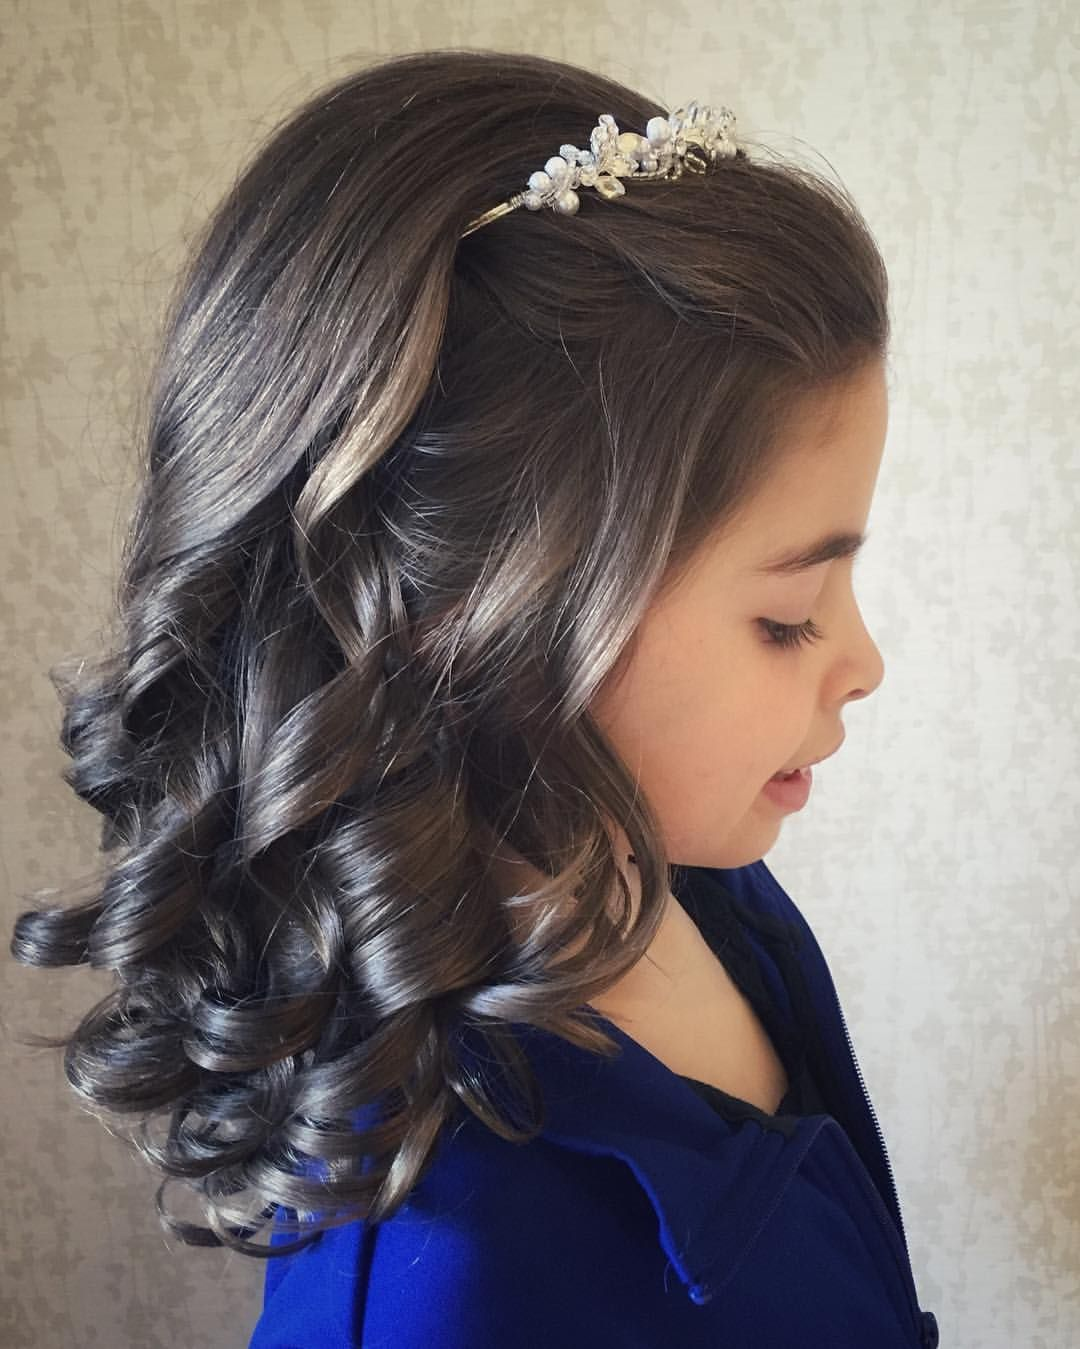 pin by nishad anjum on nishad | communion hairstyles, girls